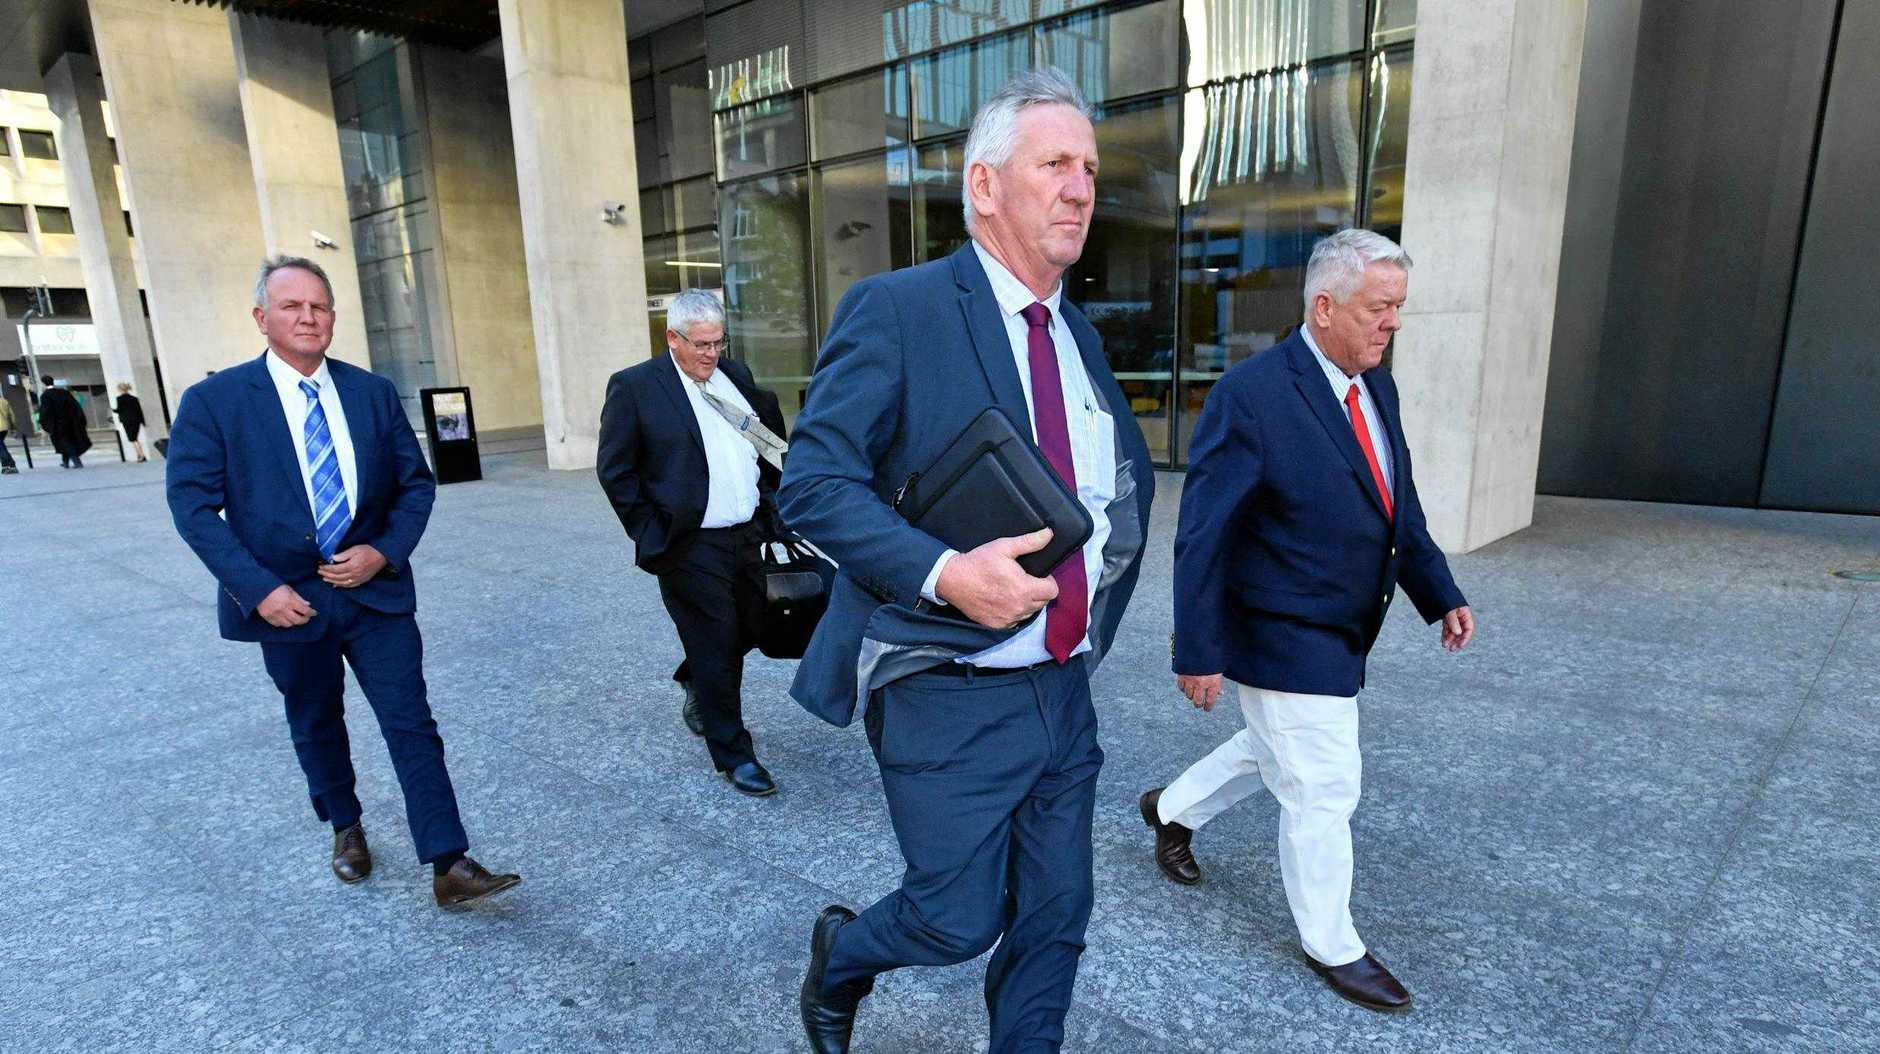 Toowoomba's Joe, Neill, Denis and John Wagner leave the Supreme Court in Brisbane.